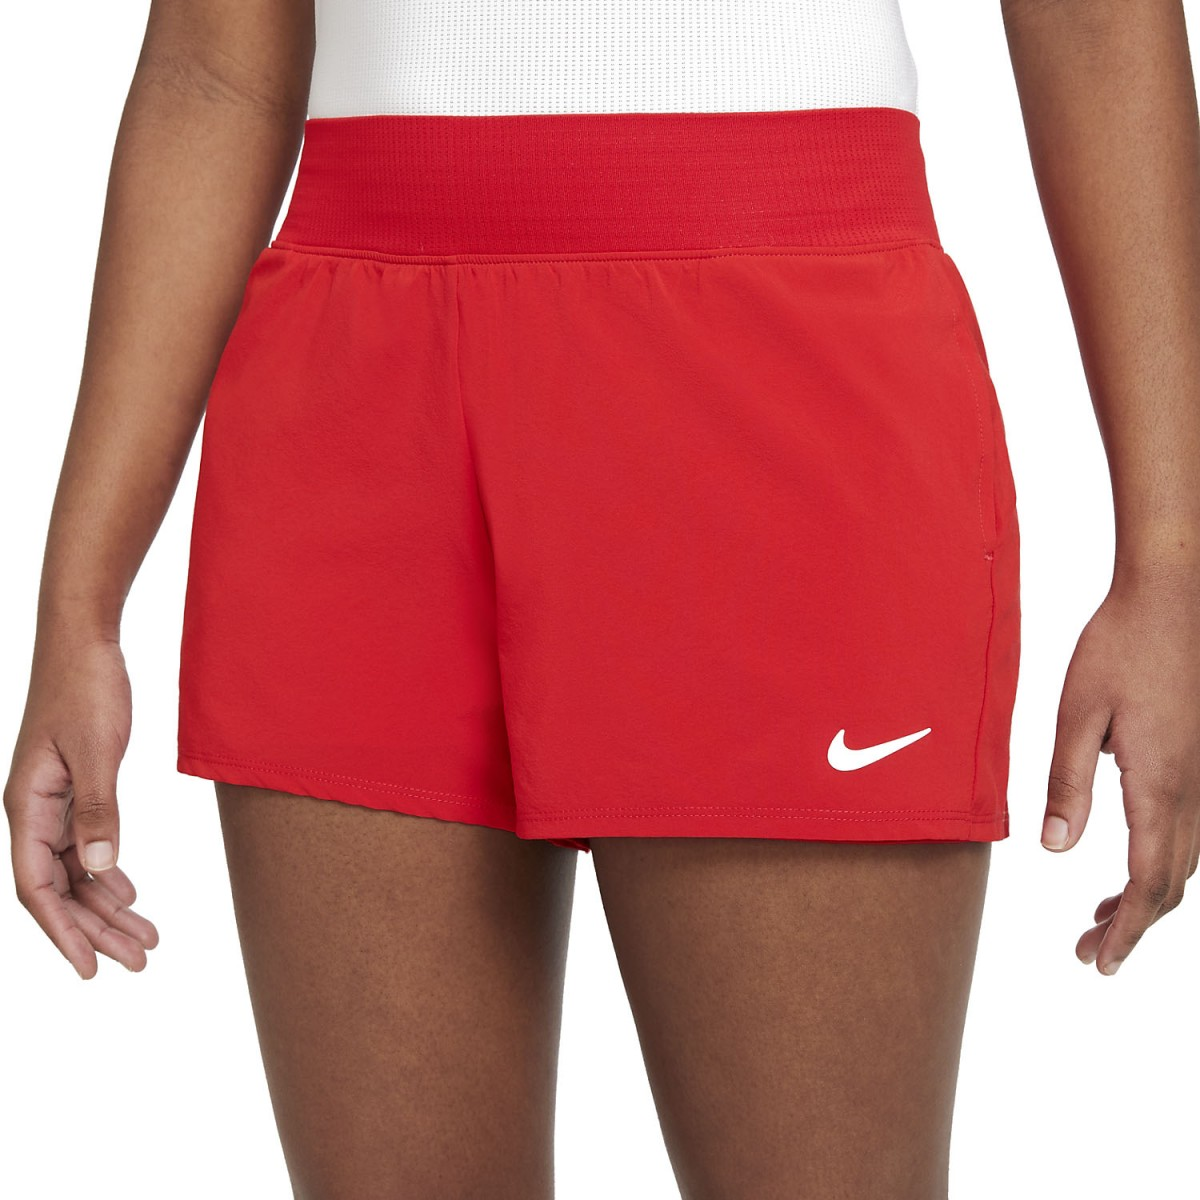 Теннисные шорты женские Nike Court Victory Short university red/white